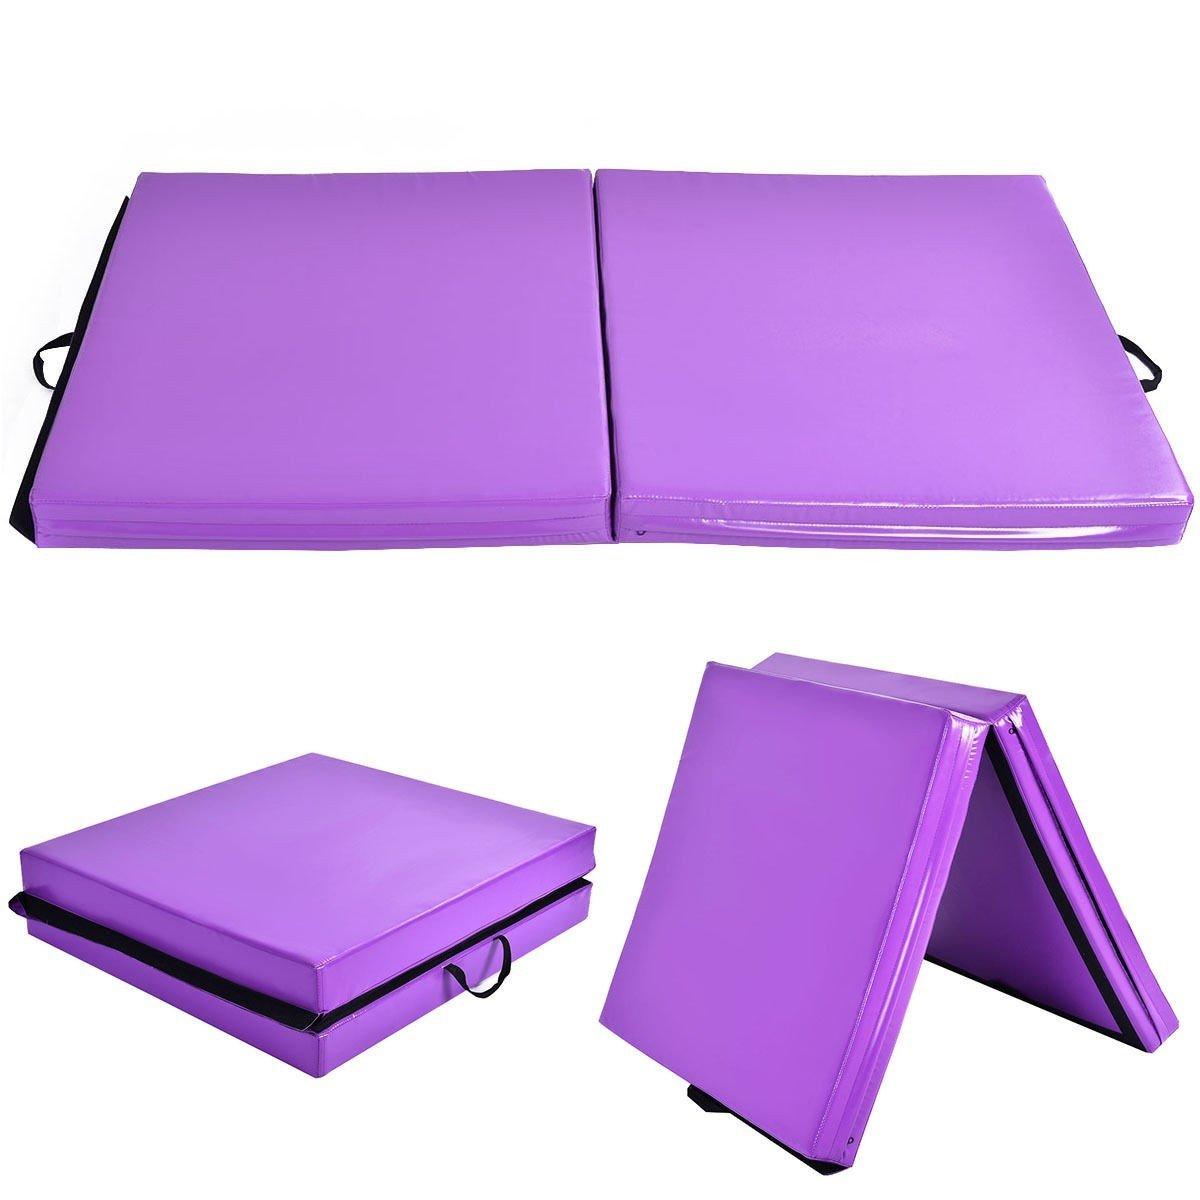 6' x 38'' x 4'' Purple Gymnastics Mat Two Folding Panel by Apontus